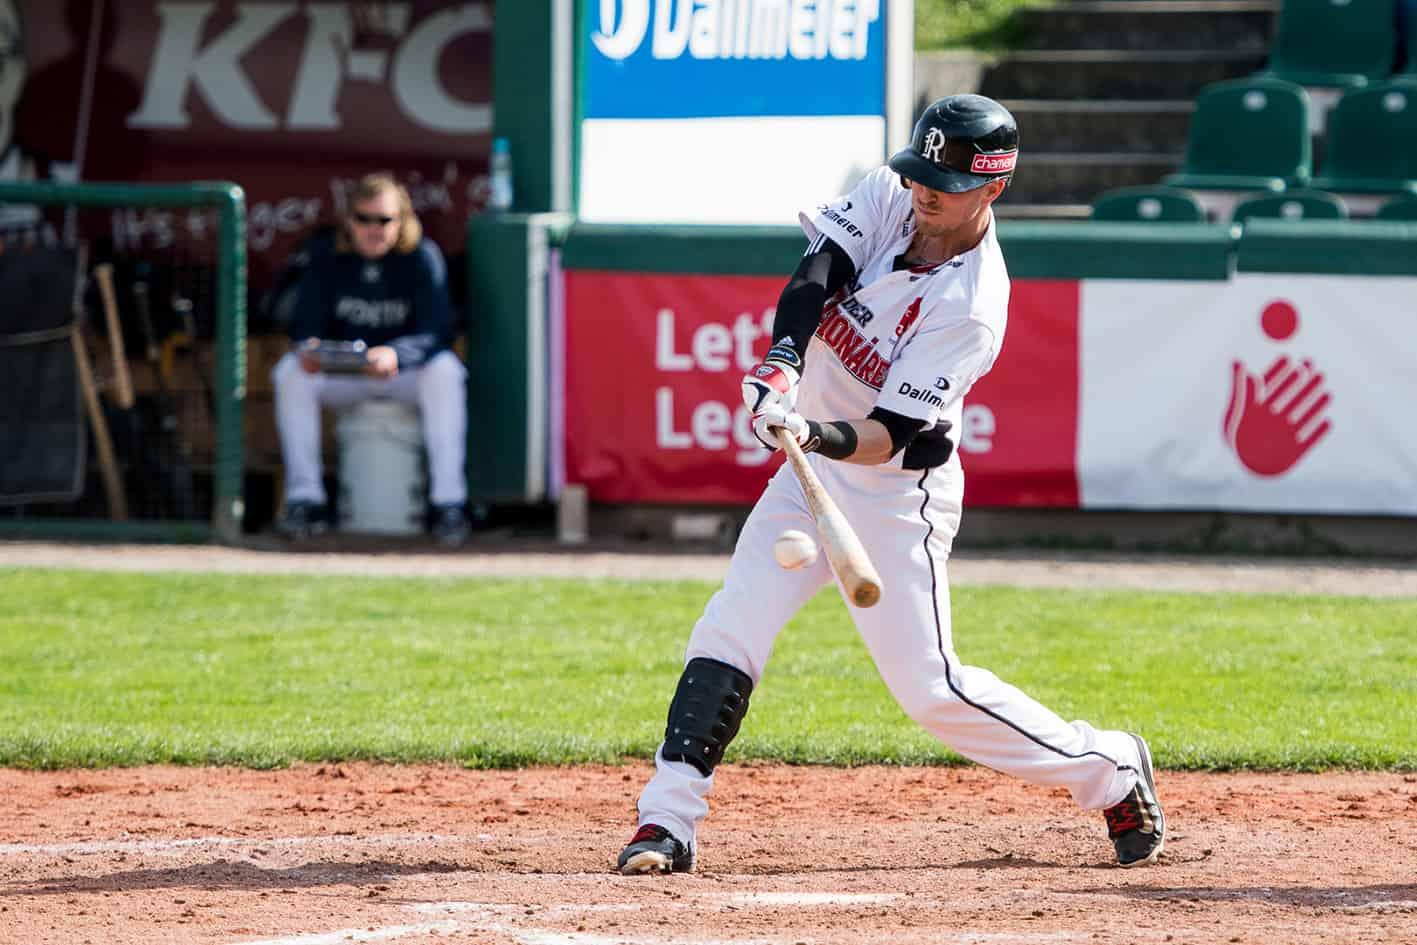 Baseball: Buchbinder Legionäre mit richtungsweisenden Spielen gegen Stuttgart Reds